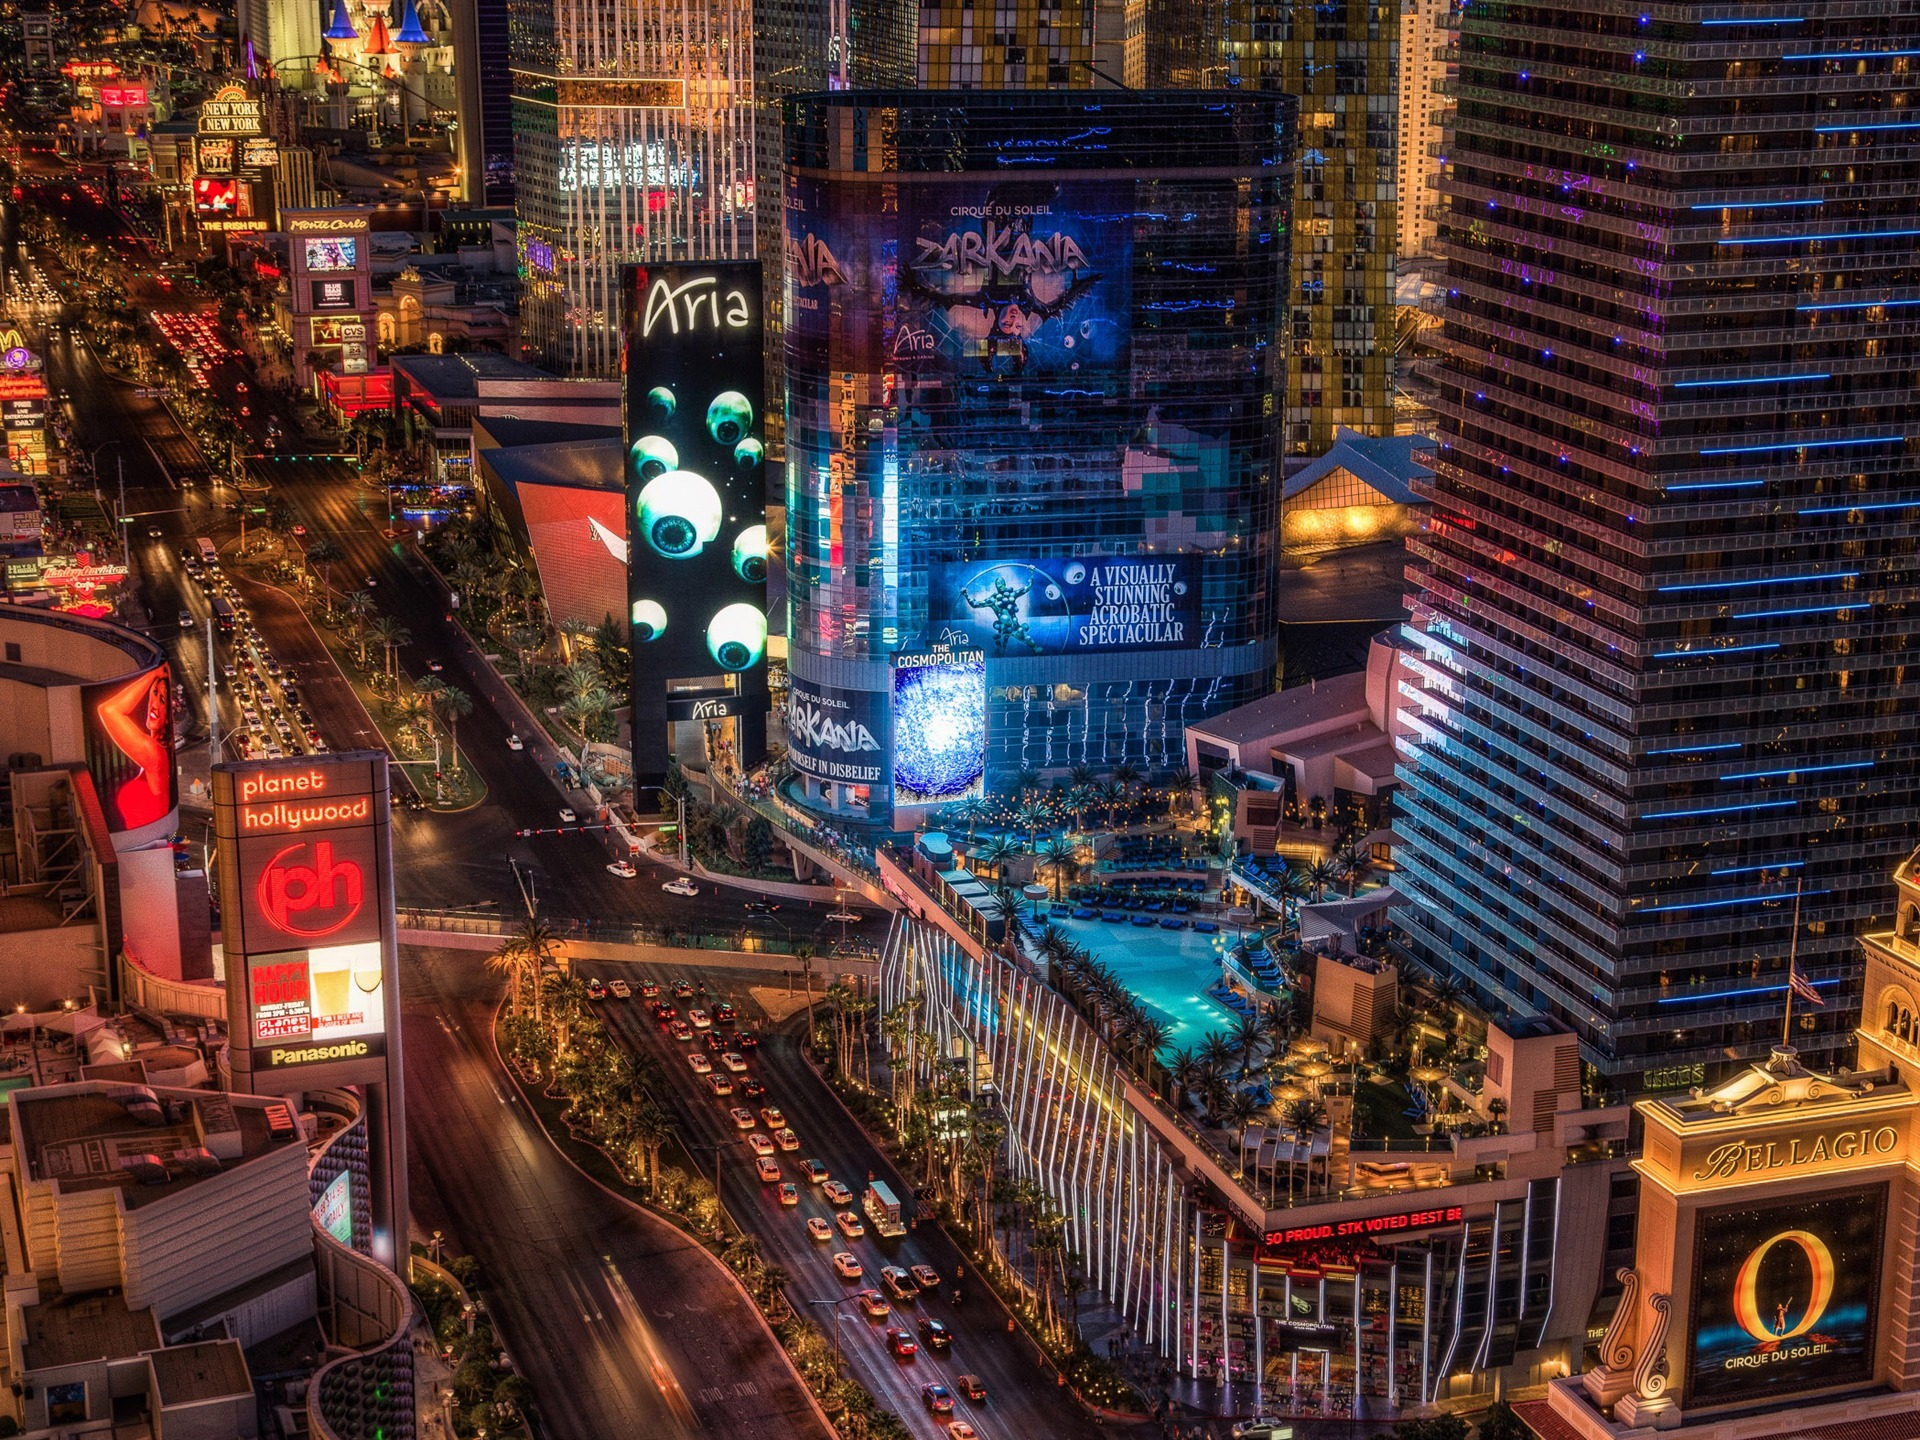 Las Vegas Boulevard Hd Desktop Wallpaper Preview 10wallpaper Com